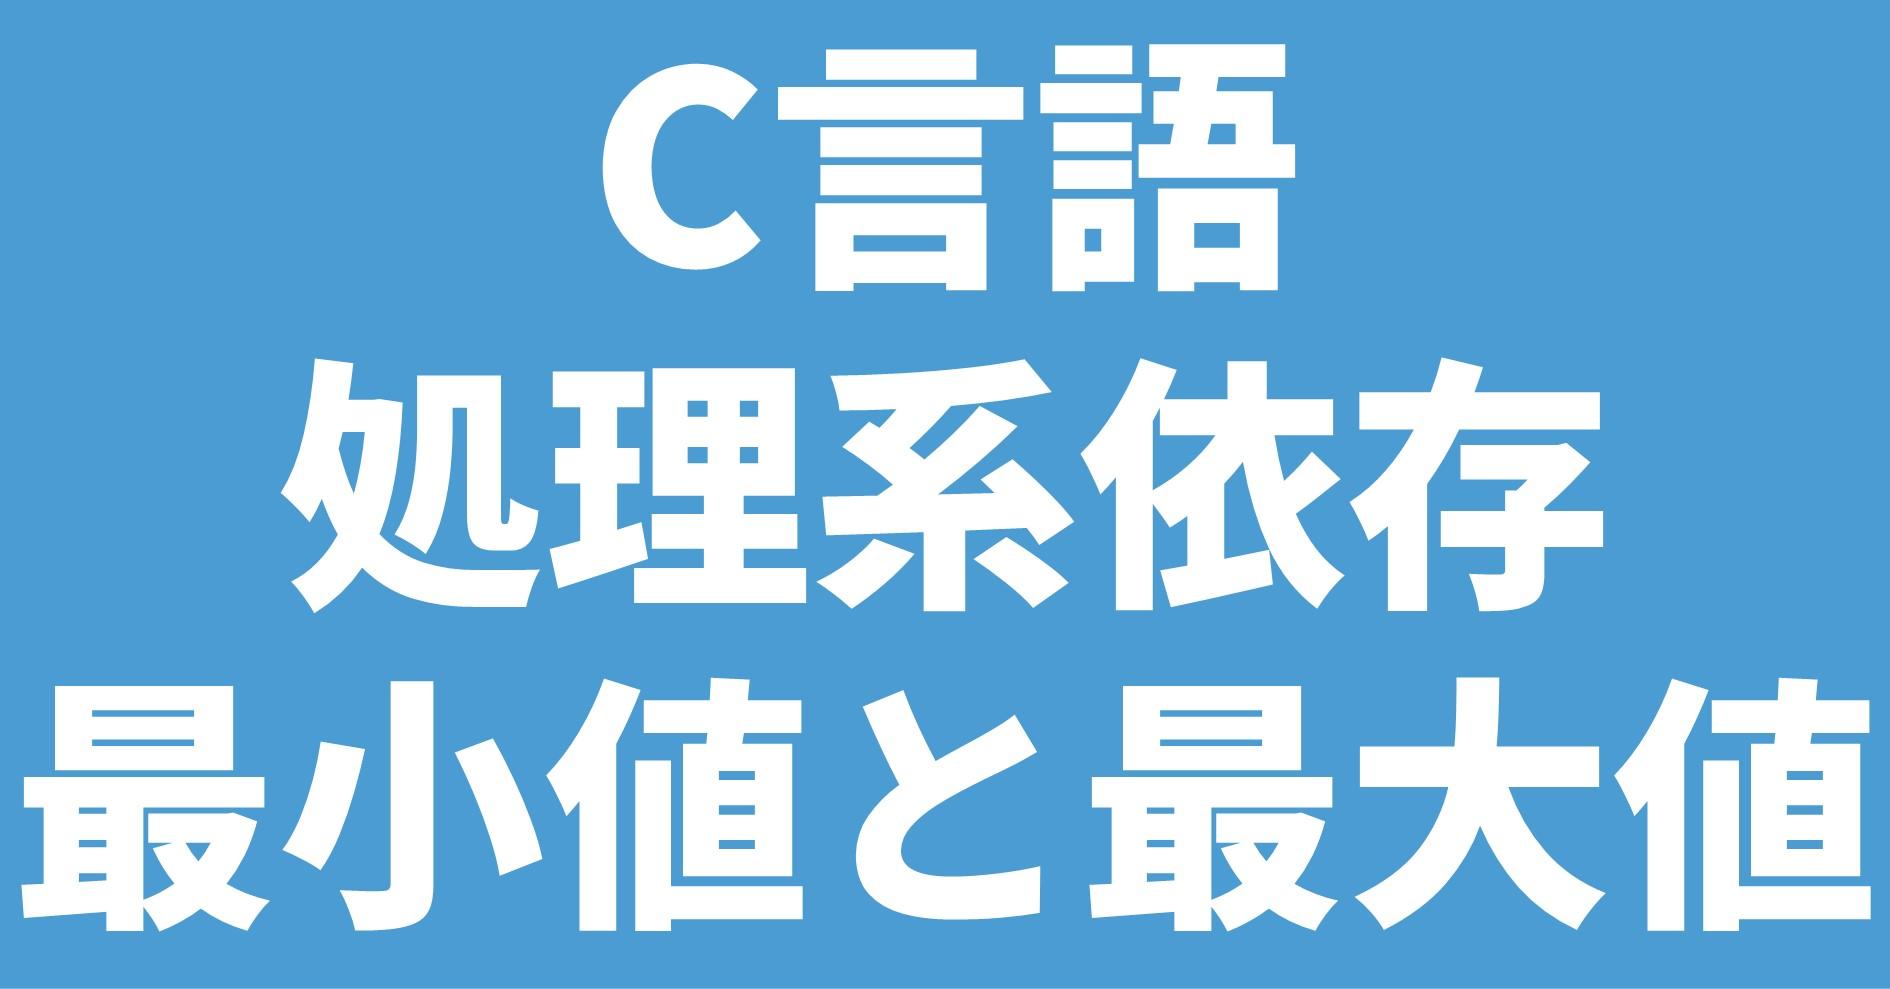 【C言語】処理系依存 最小値と最大値